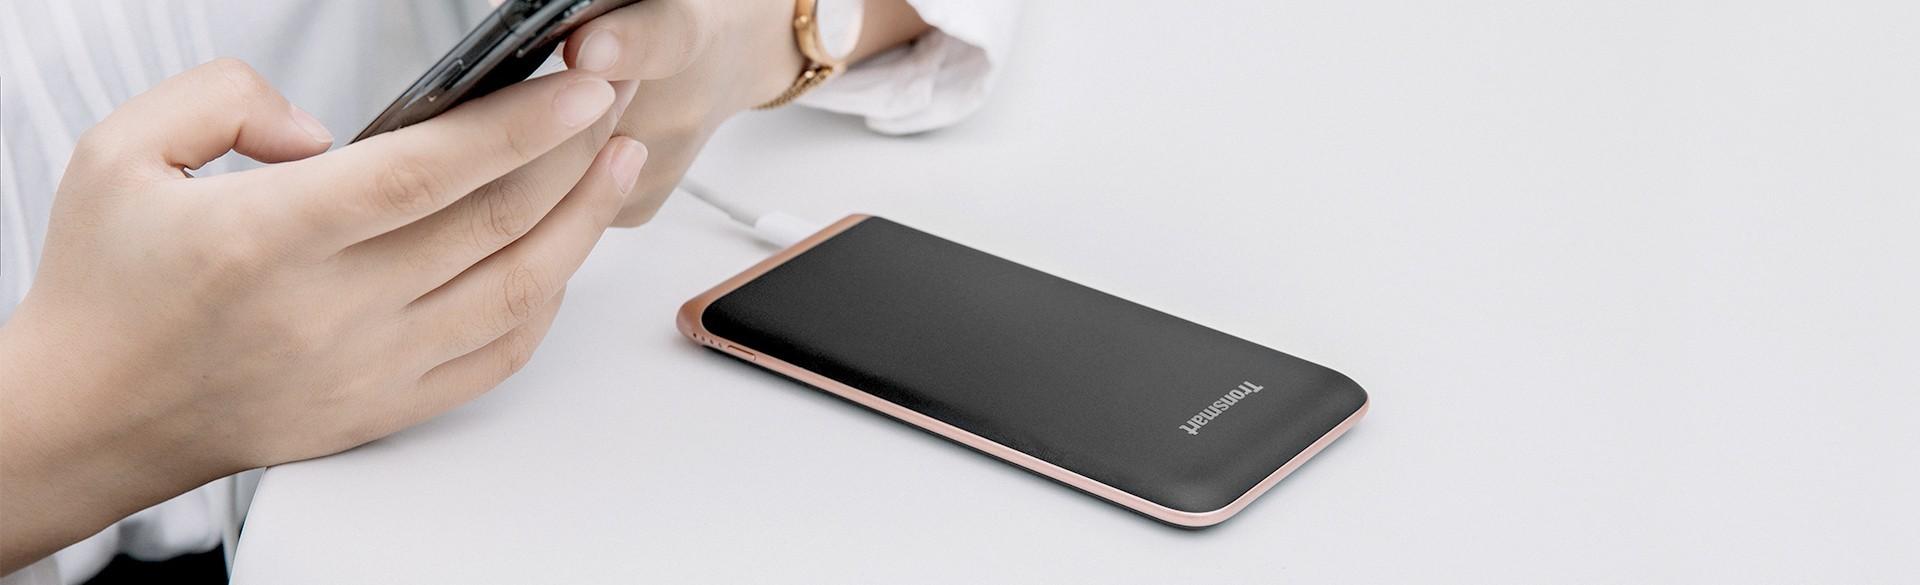 Caricabatterie portatili